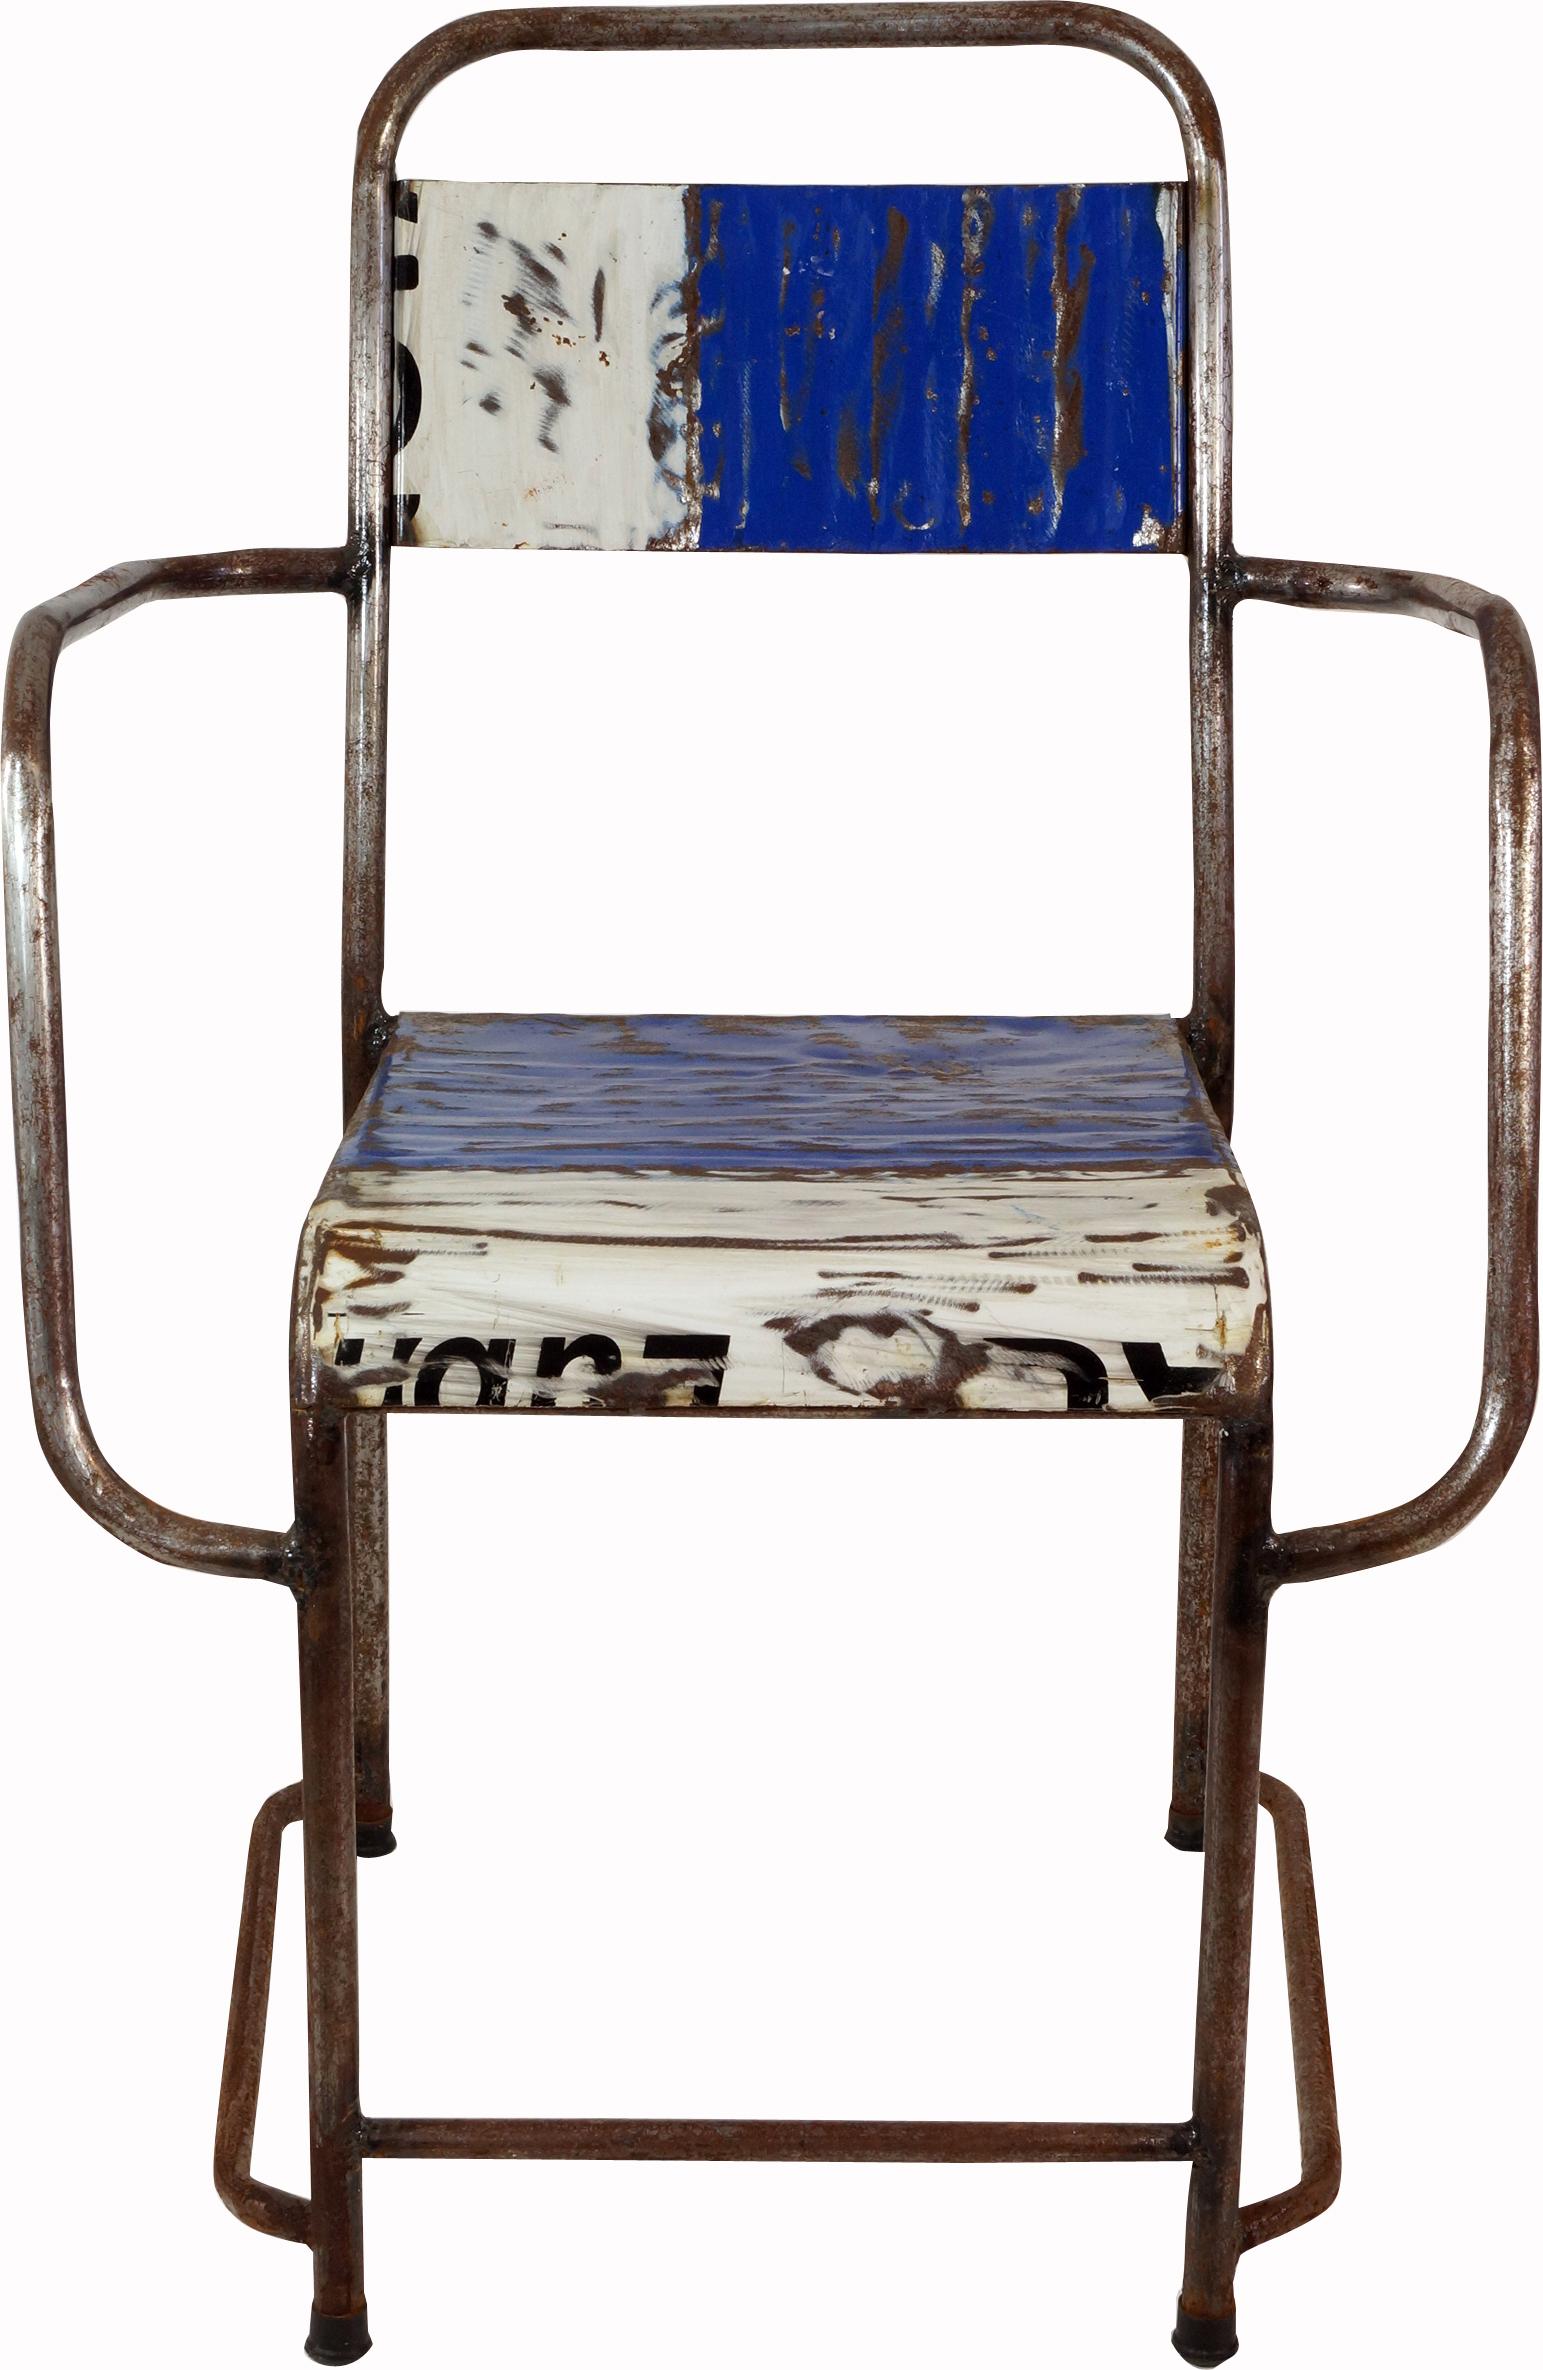 metallstuhl industrial look. Black Bedroom Furniture Sets. Home Design Ideas